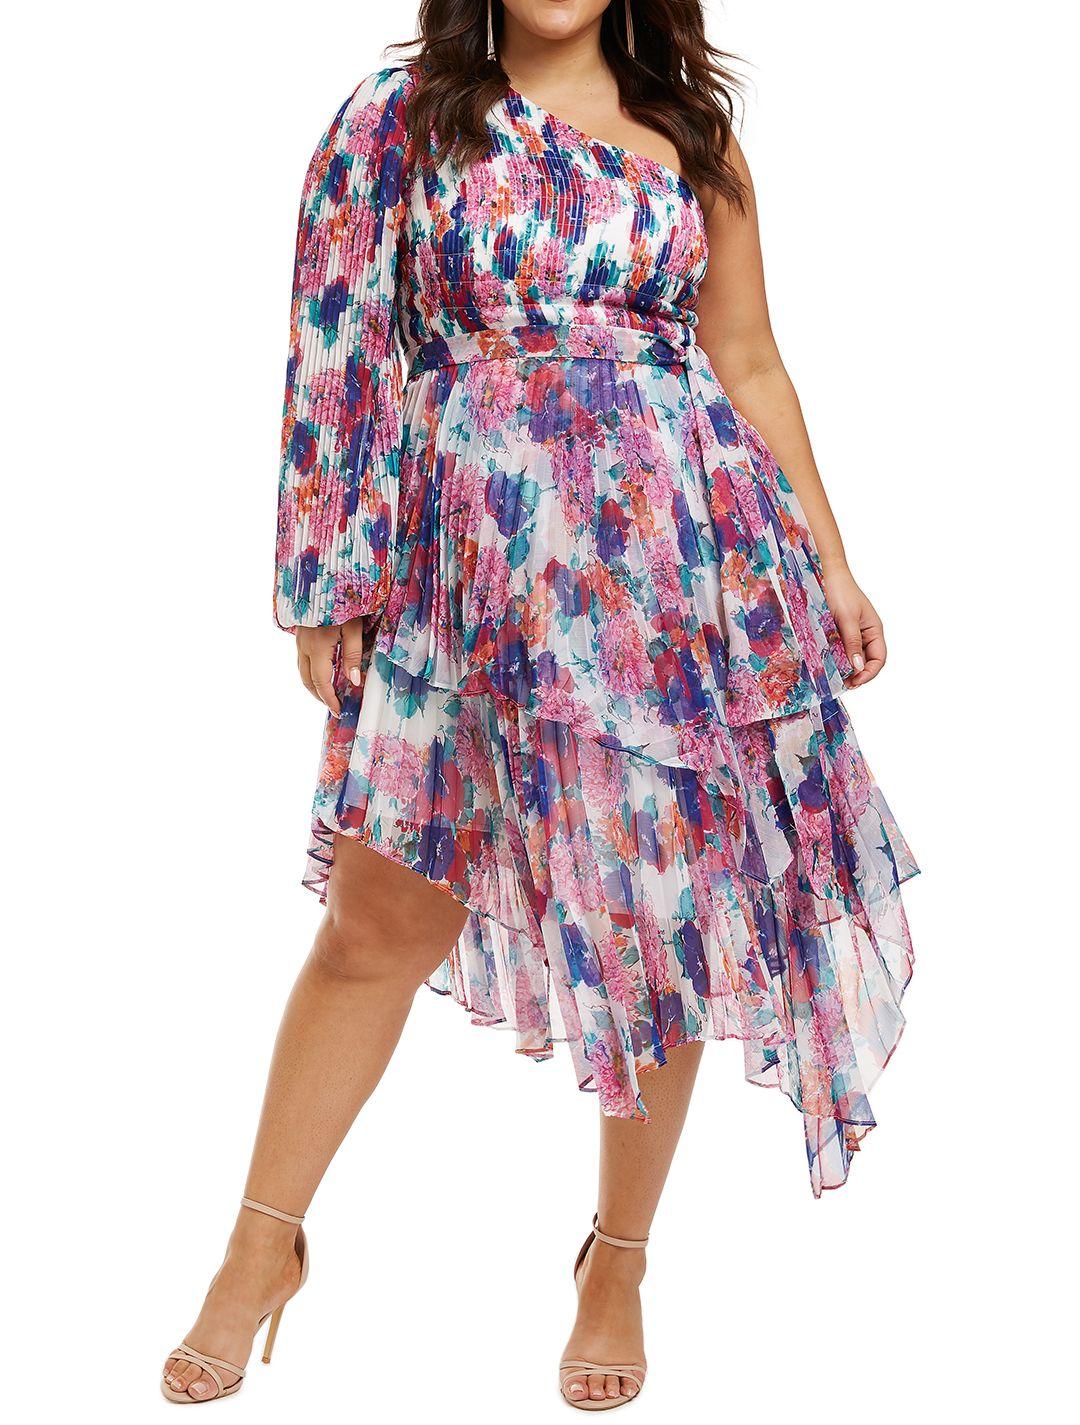 Talulah-Always-You-Midi-Dress-Floral-Fantasia-Print-Front